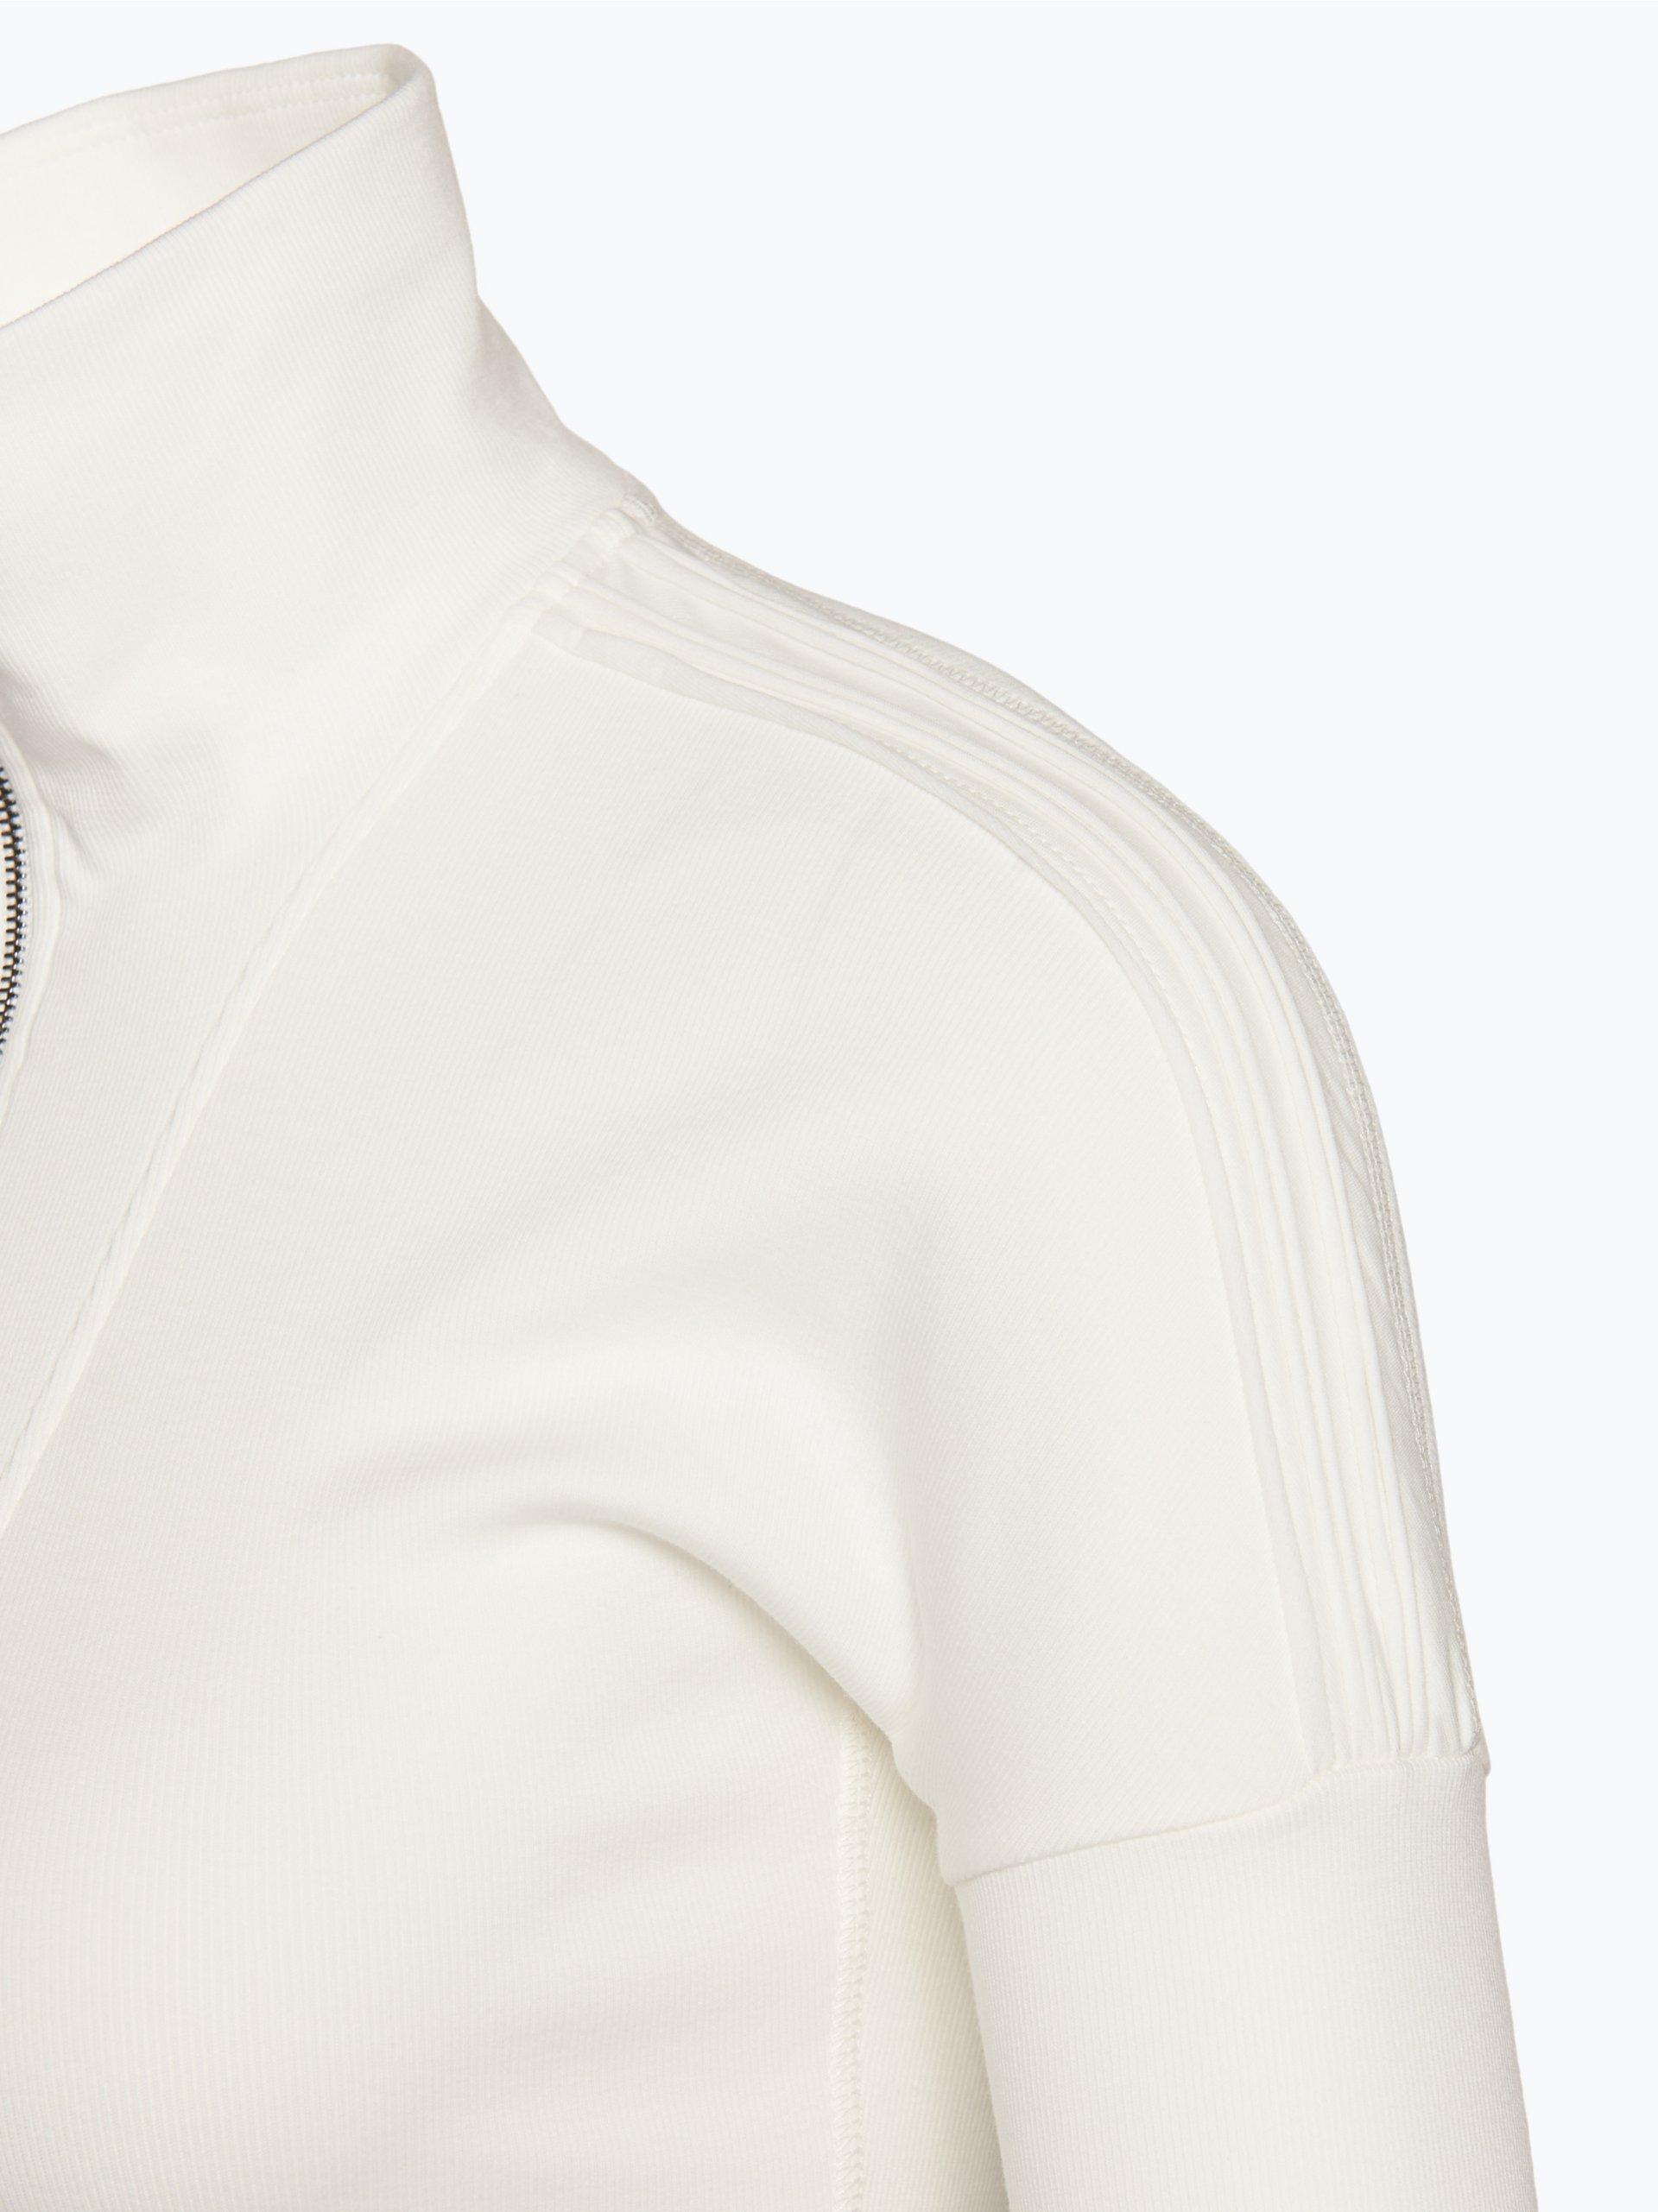 marc cain sports damen t shirt ecru uni online kaufen. Black Bedroom Furniture Sets. Home Design Ideas